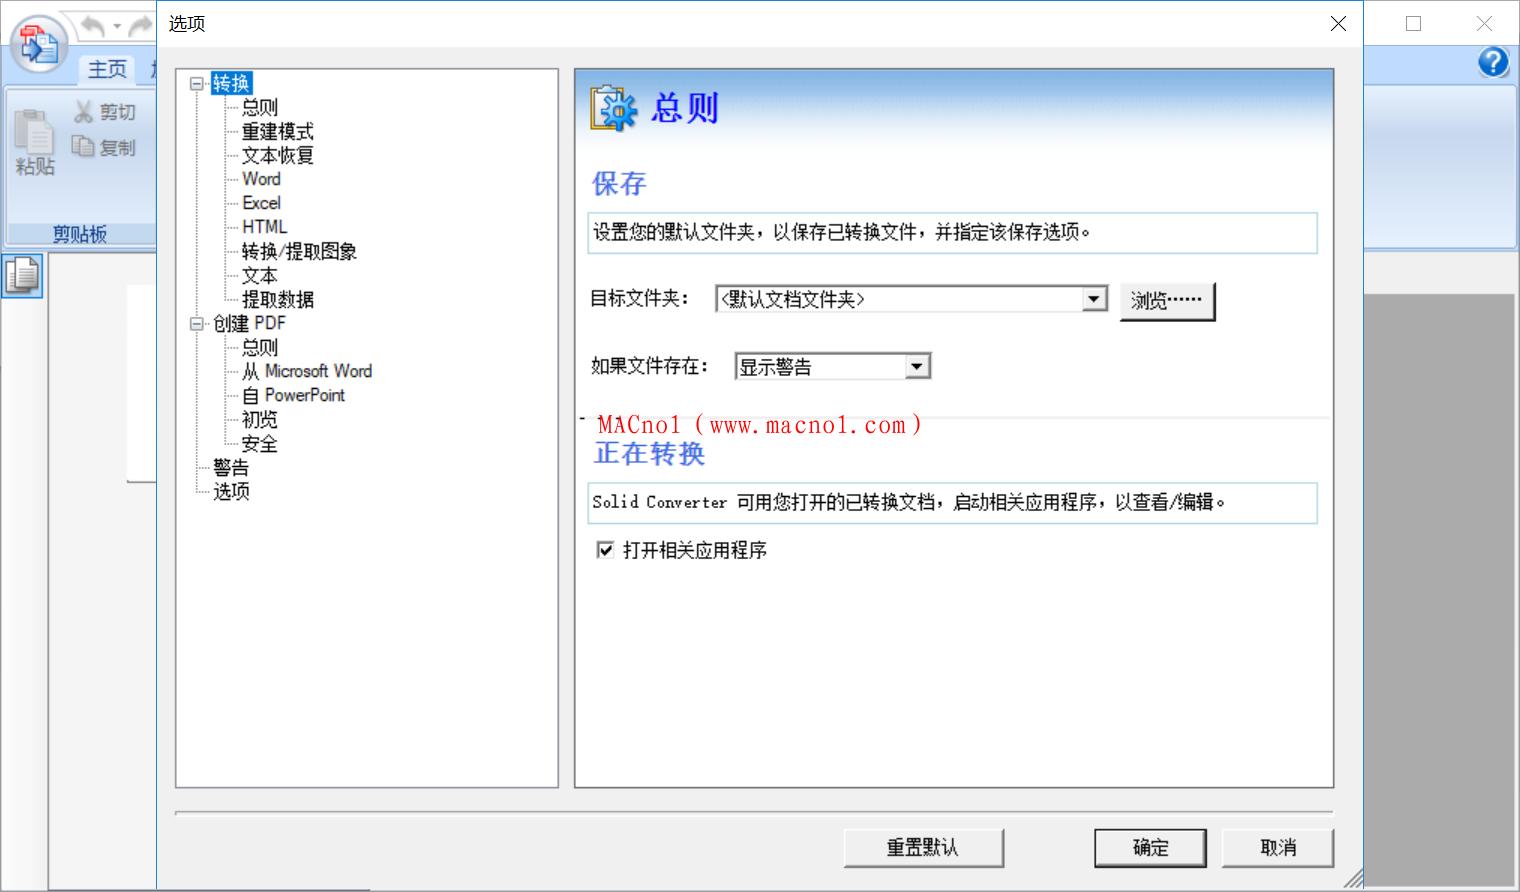 Solid Converter PDF 破解版.png